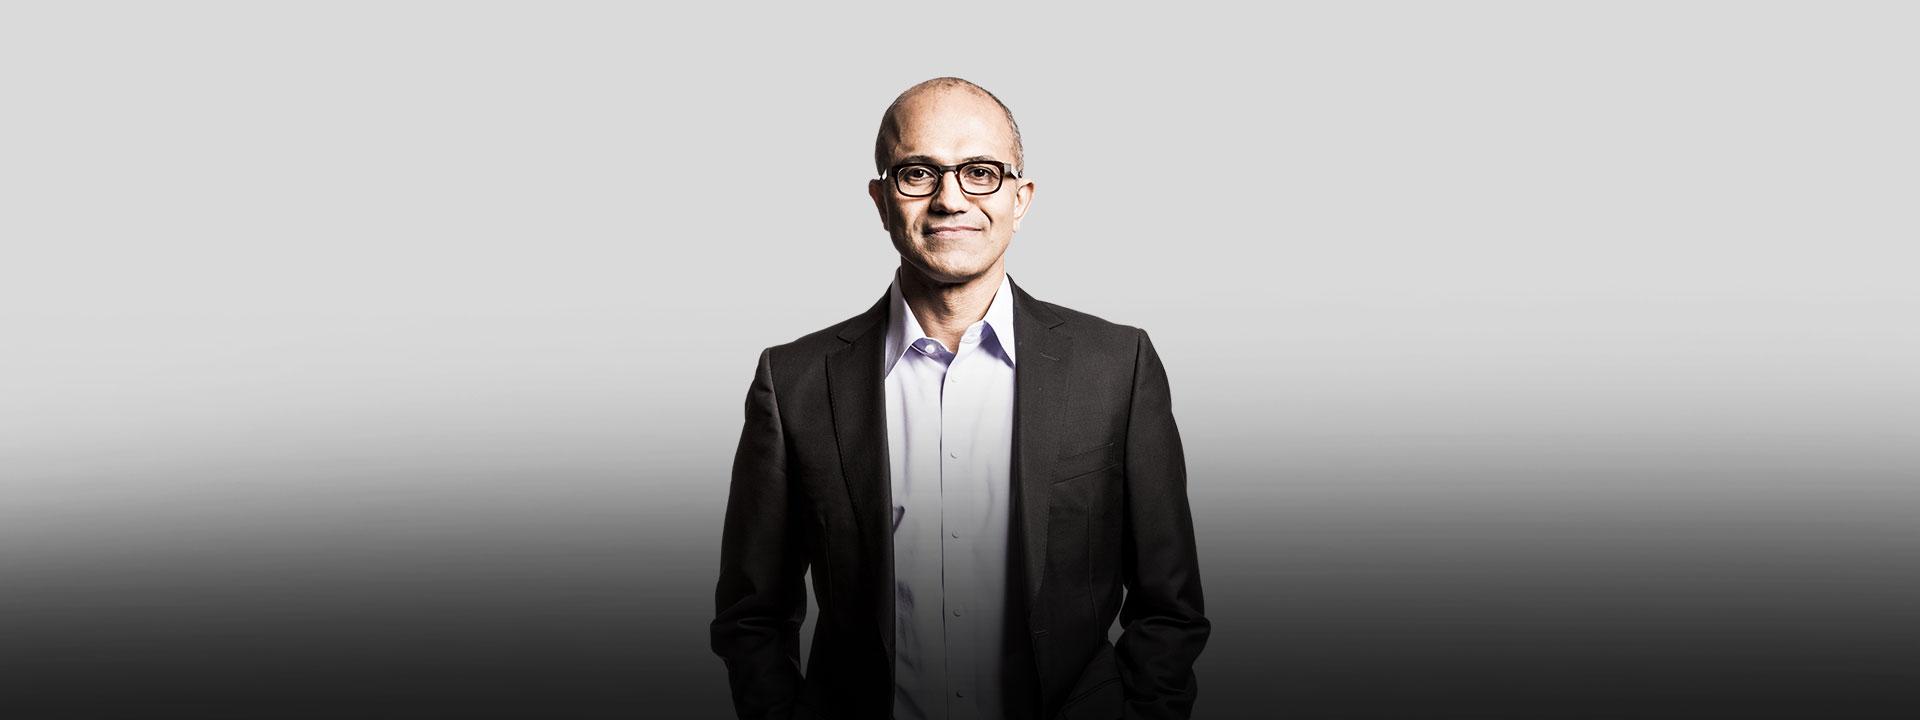 Image of Satya Nadella, Register for Microsoft Developer Day